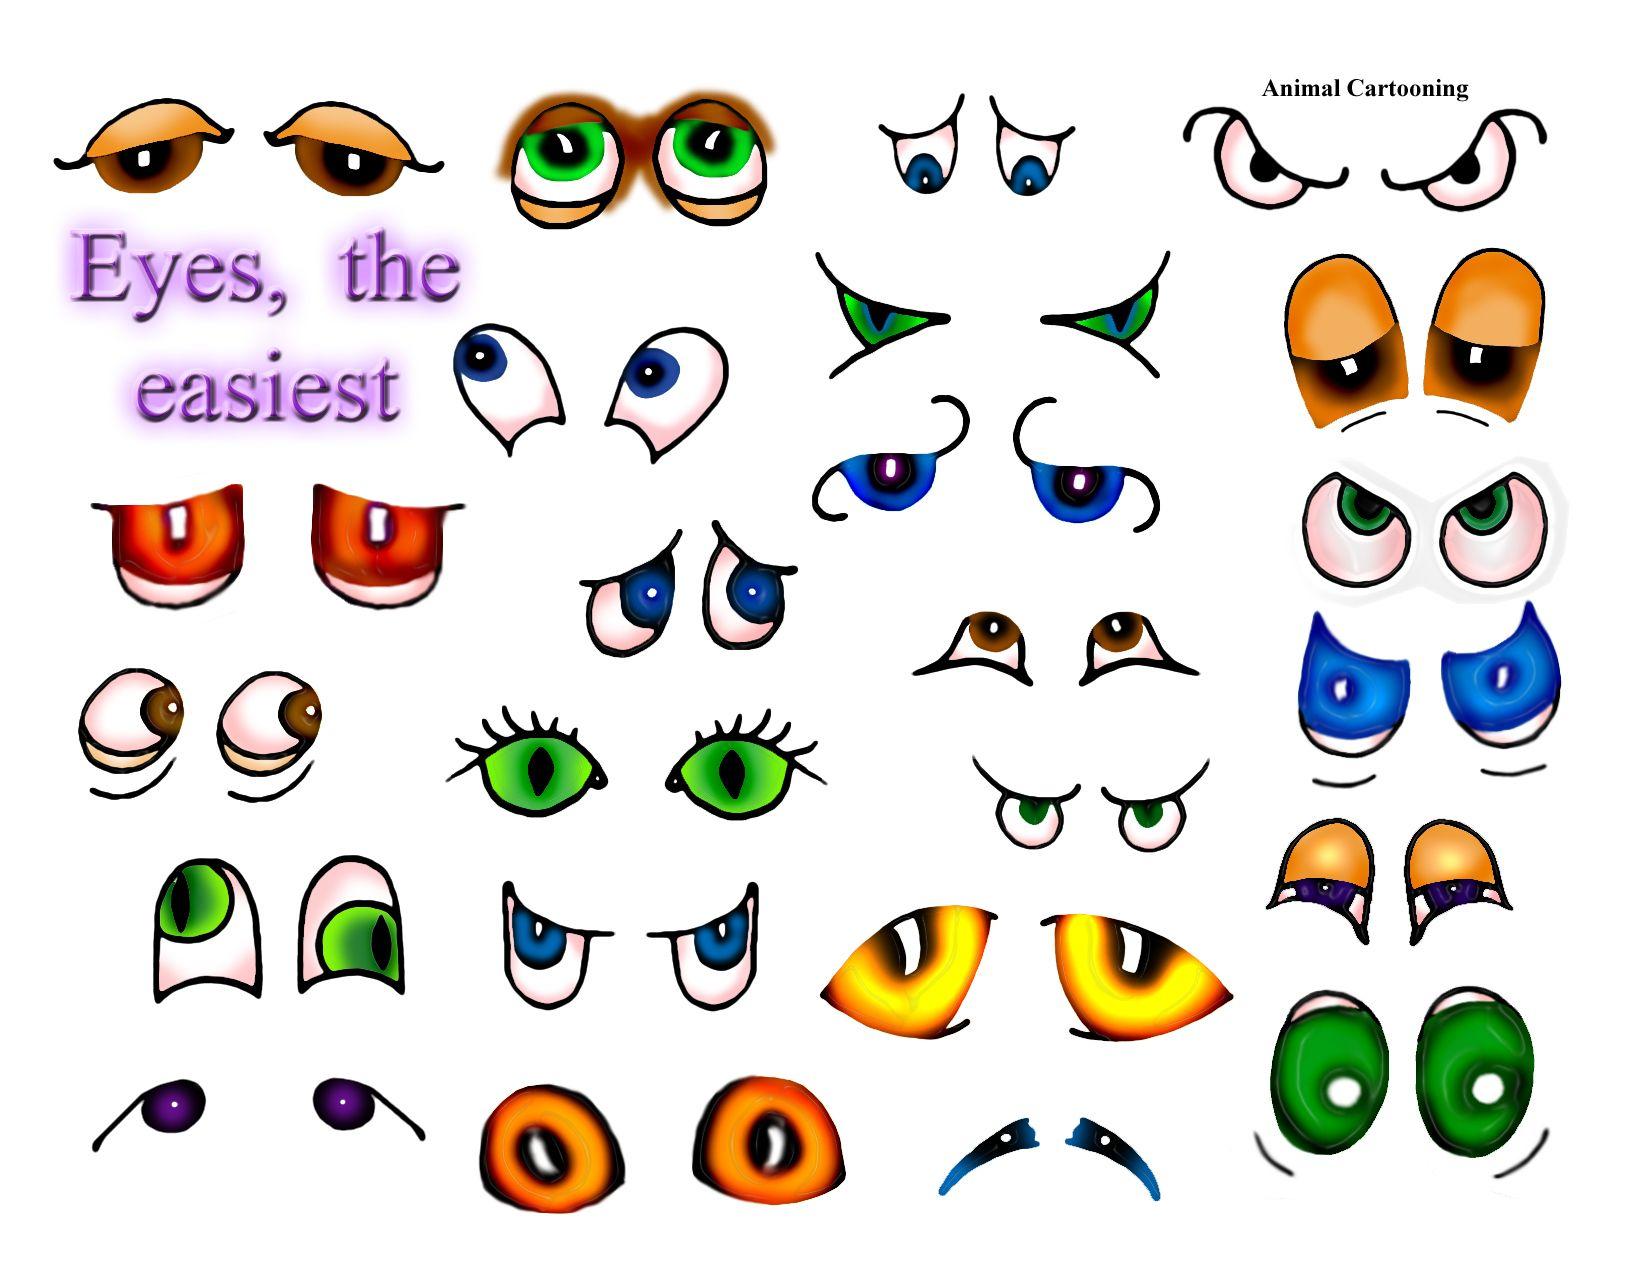 Cartoon Animal Eyes Drawings Drawing Lessons Doodle Drawings